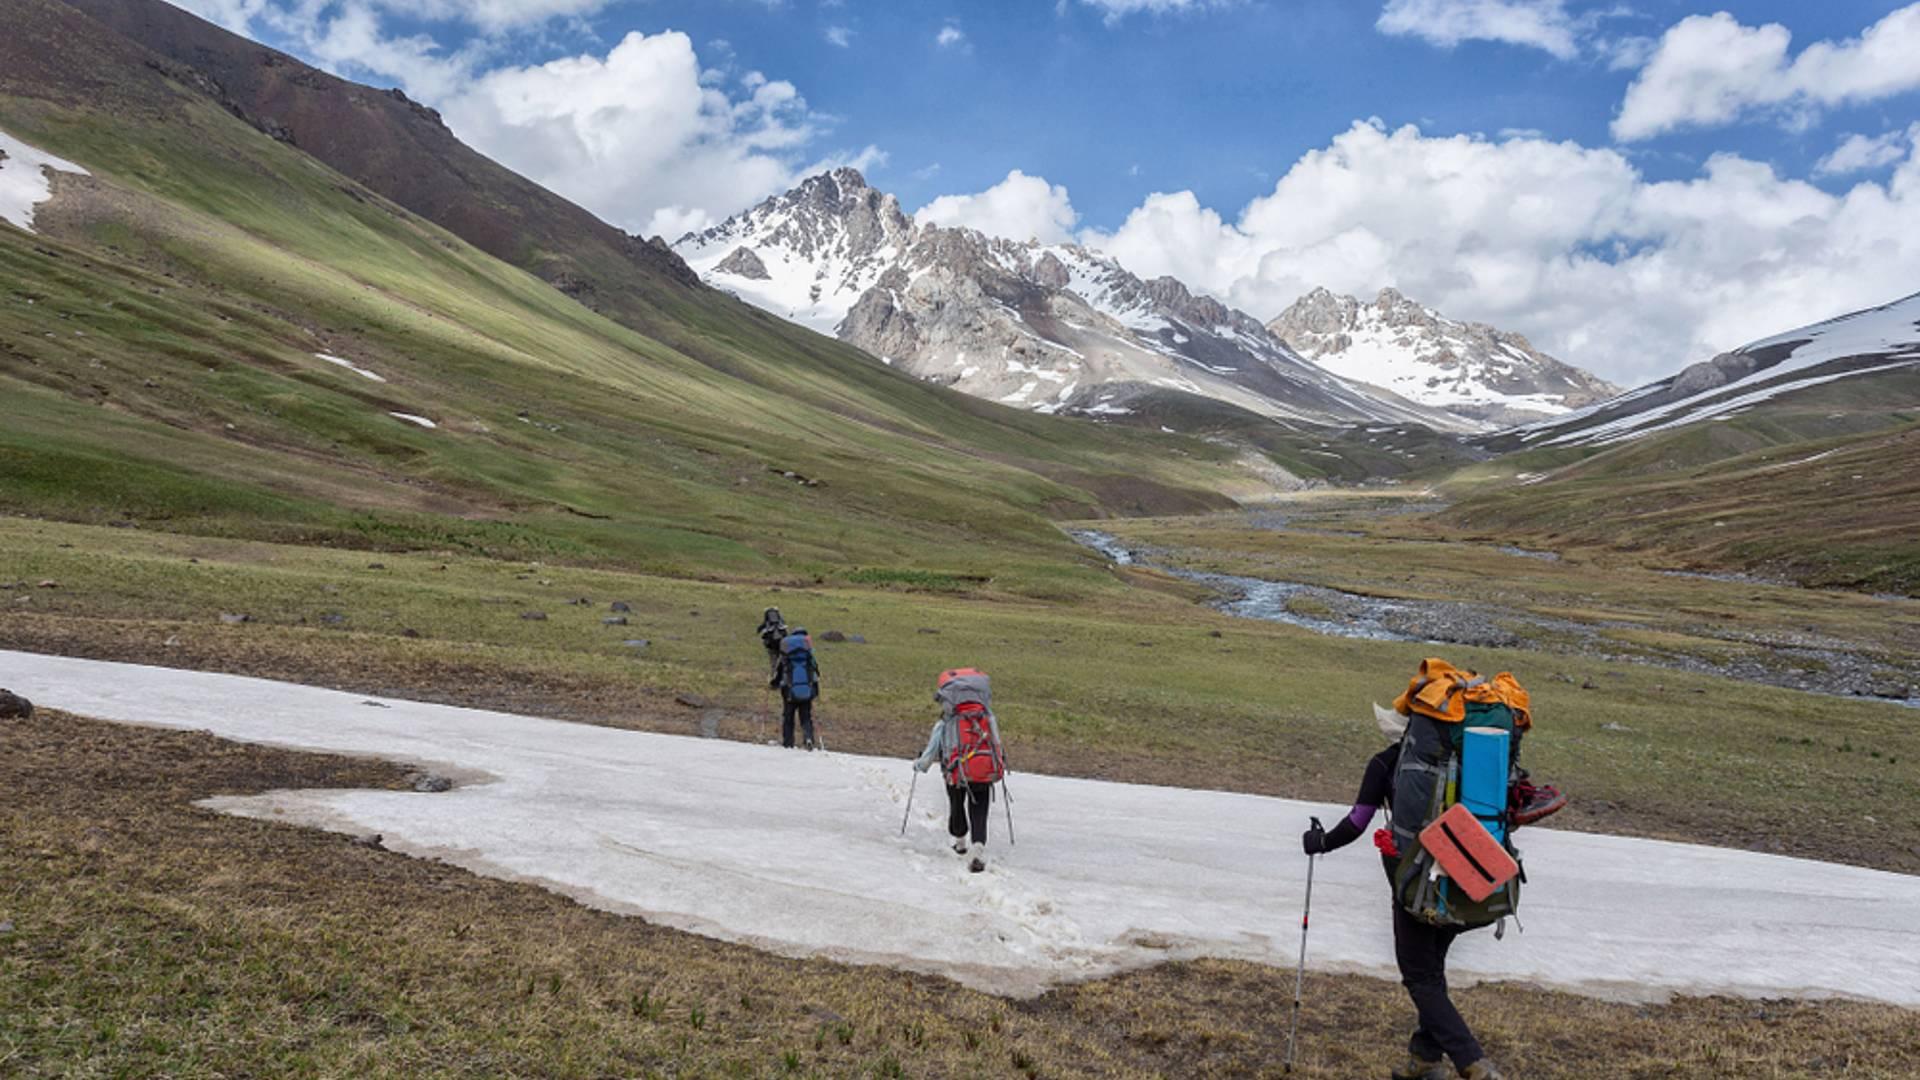 Wanderung zu den himmlischen Bergen